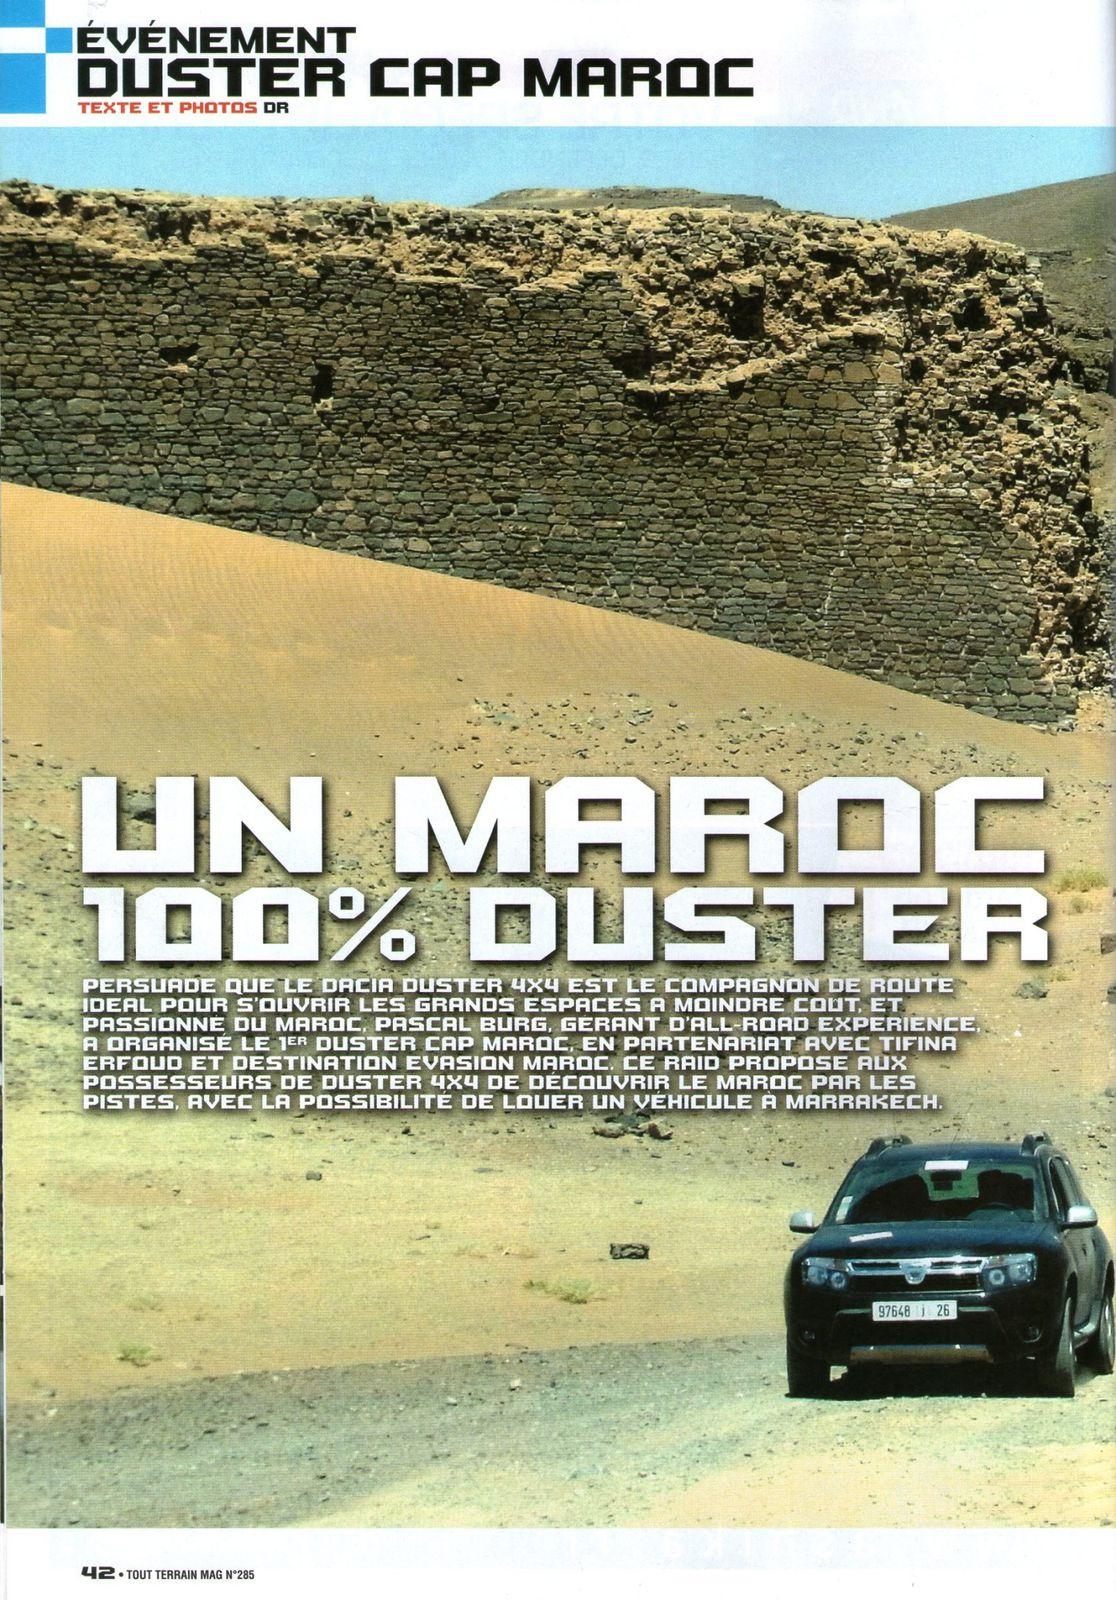 Le DUSTER CAP MAROC Tout-Terrain Magazine